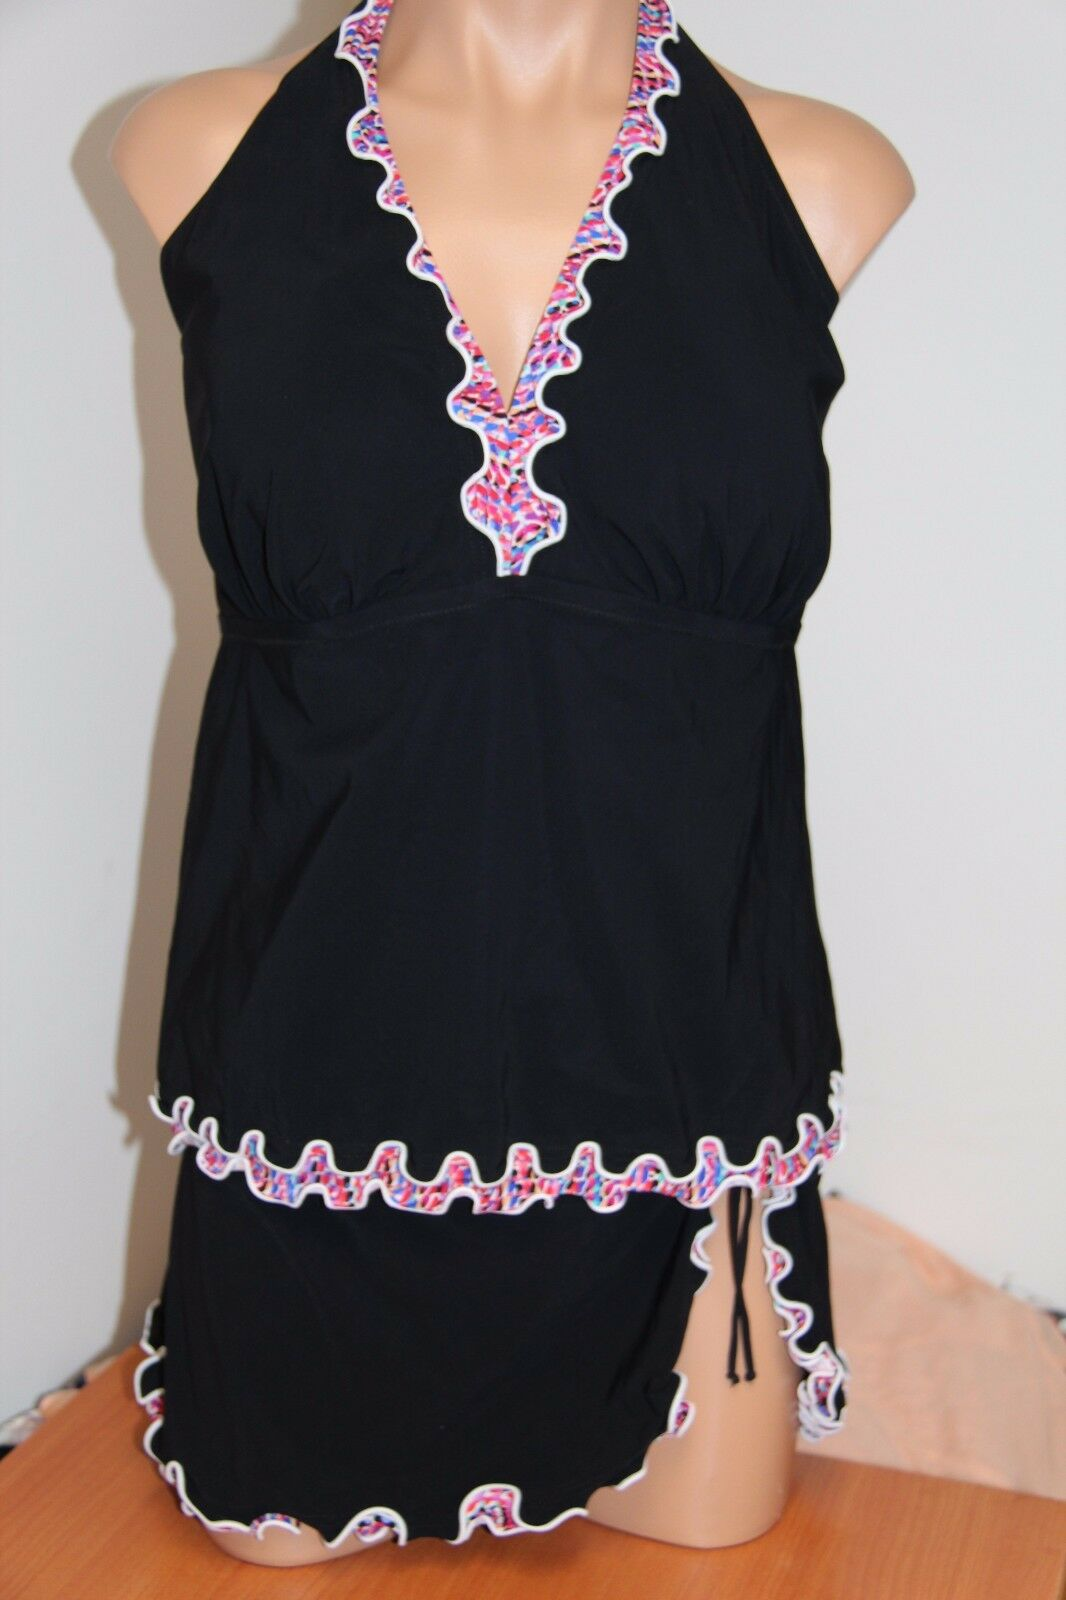 NWT Profile Swimsuit Tankini Bikini 2pc set Plus Sz 22W Multi Skirt Halter